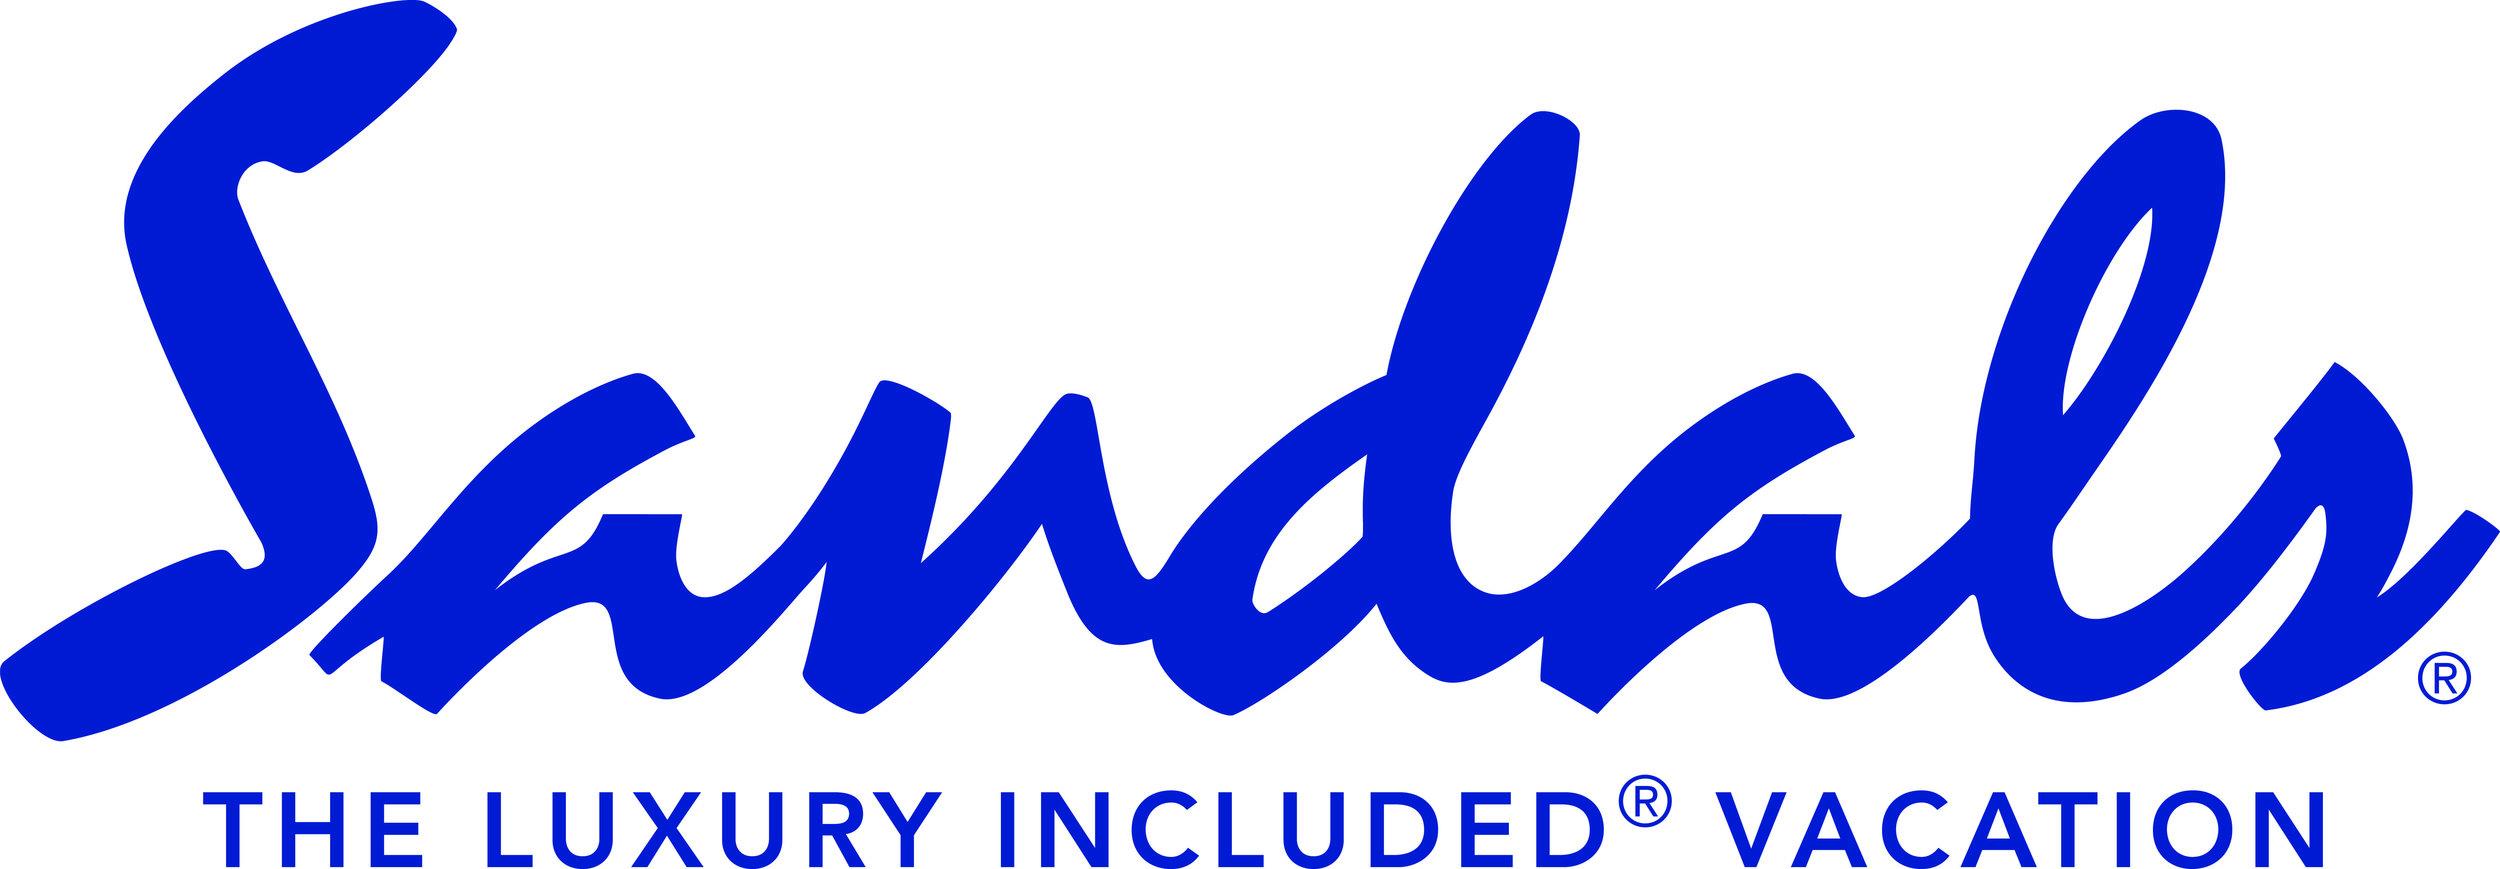 Sandals Logo Royal (LIV)_Aug 2018.jpg